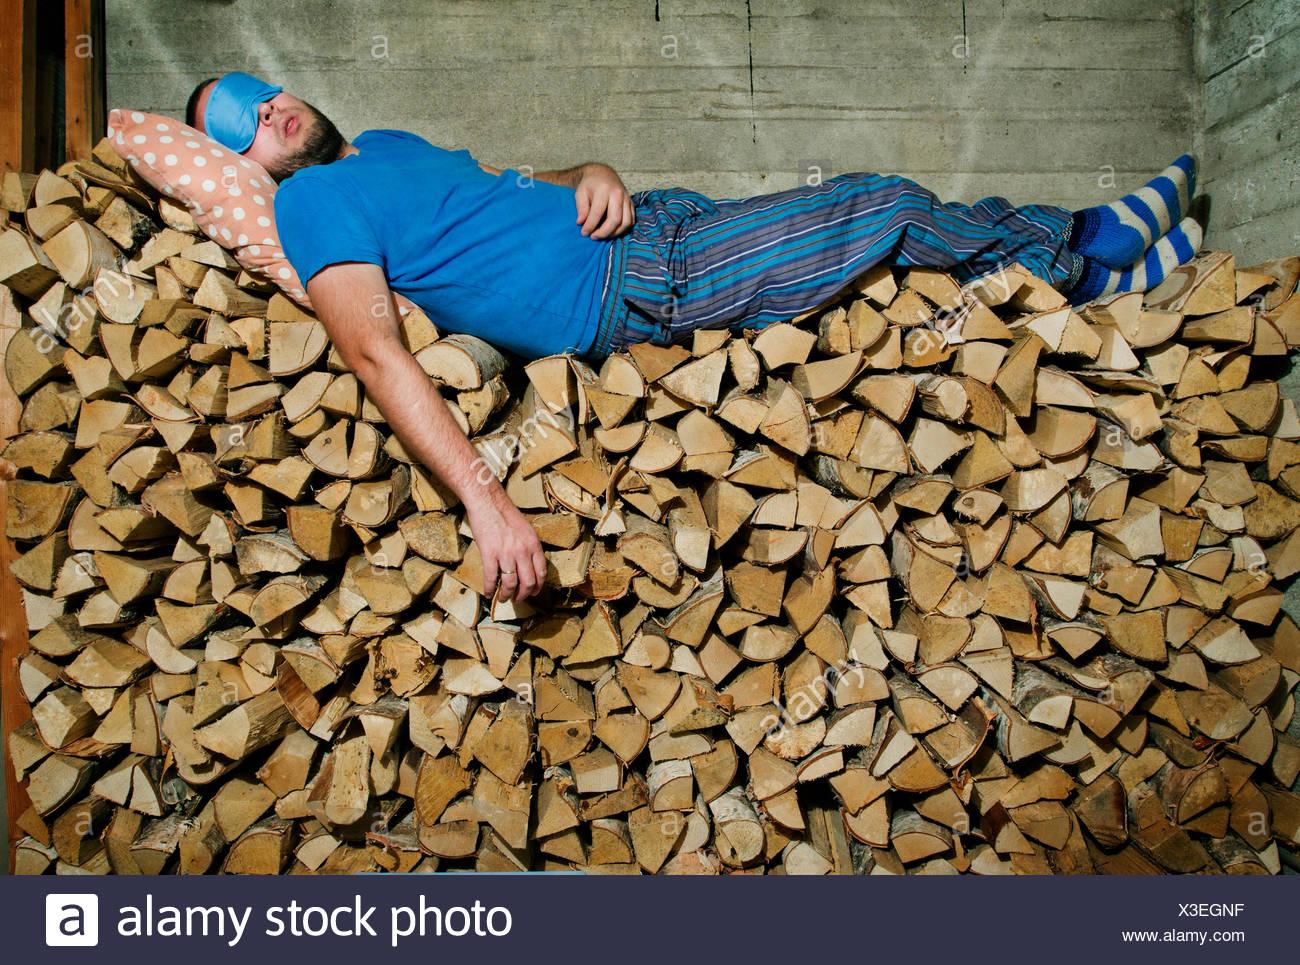 Finland, Heinola, Man sleeping on pile of firewood - Stock Image